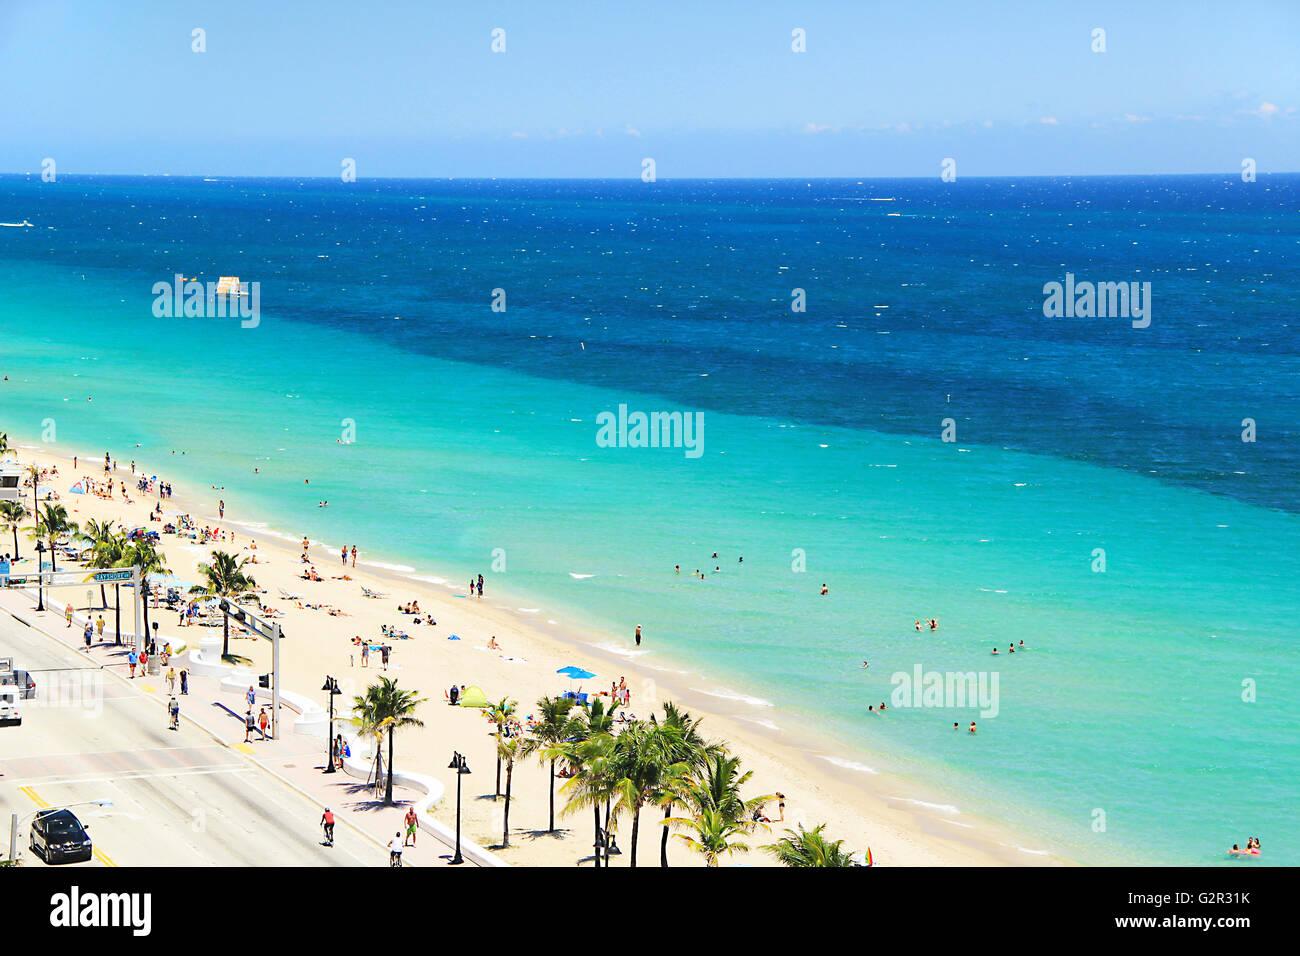 Fort Lauderdale Beach near Miami, Florida USA Stock Photo